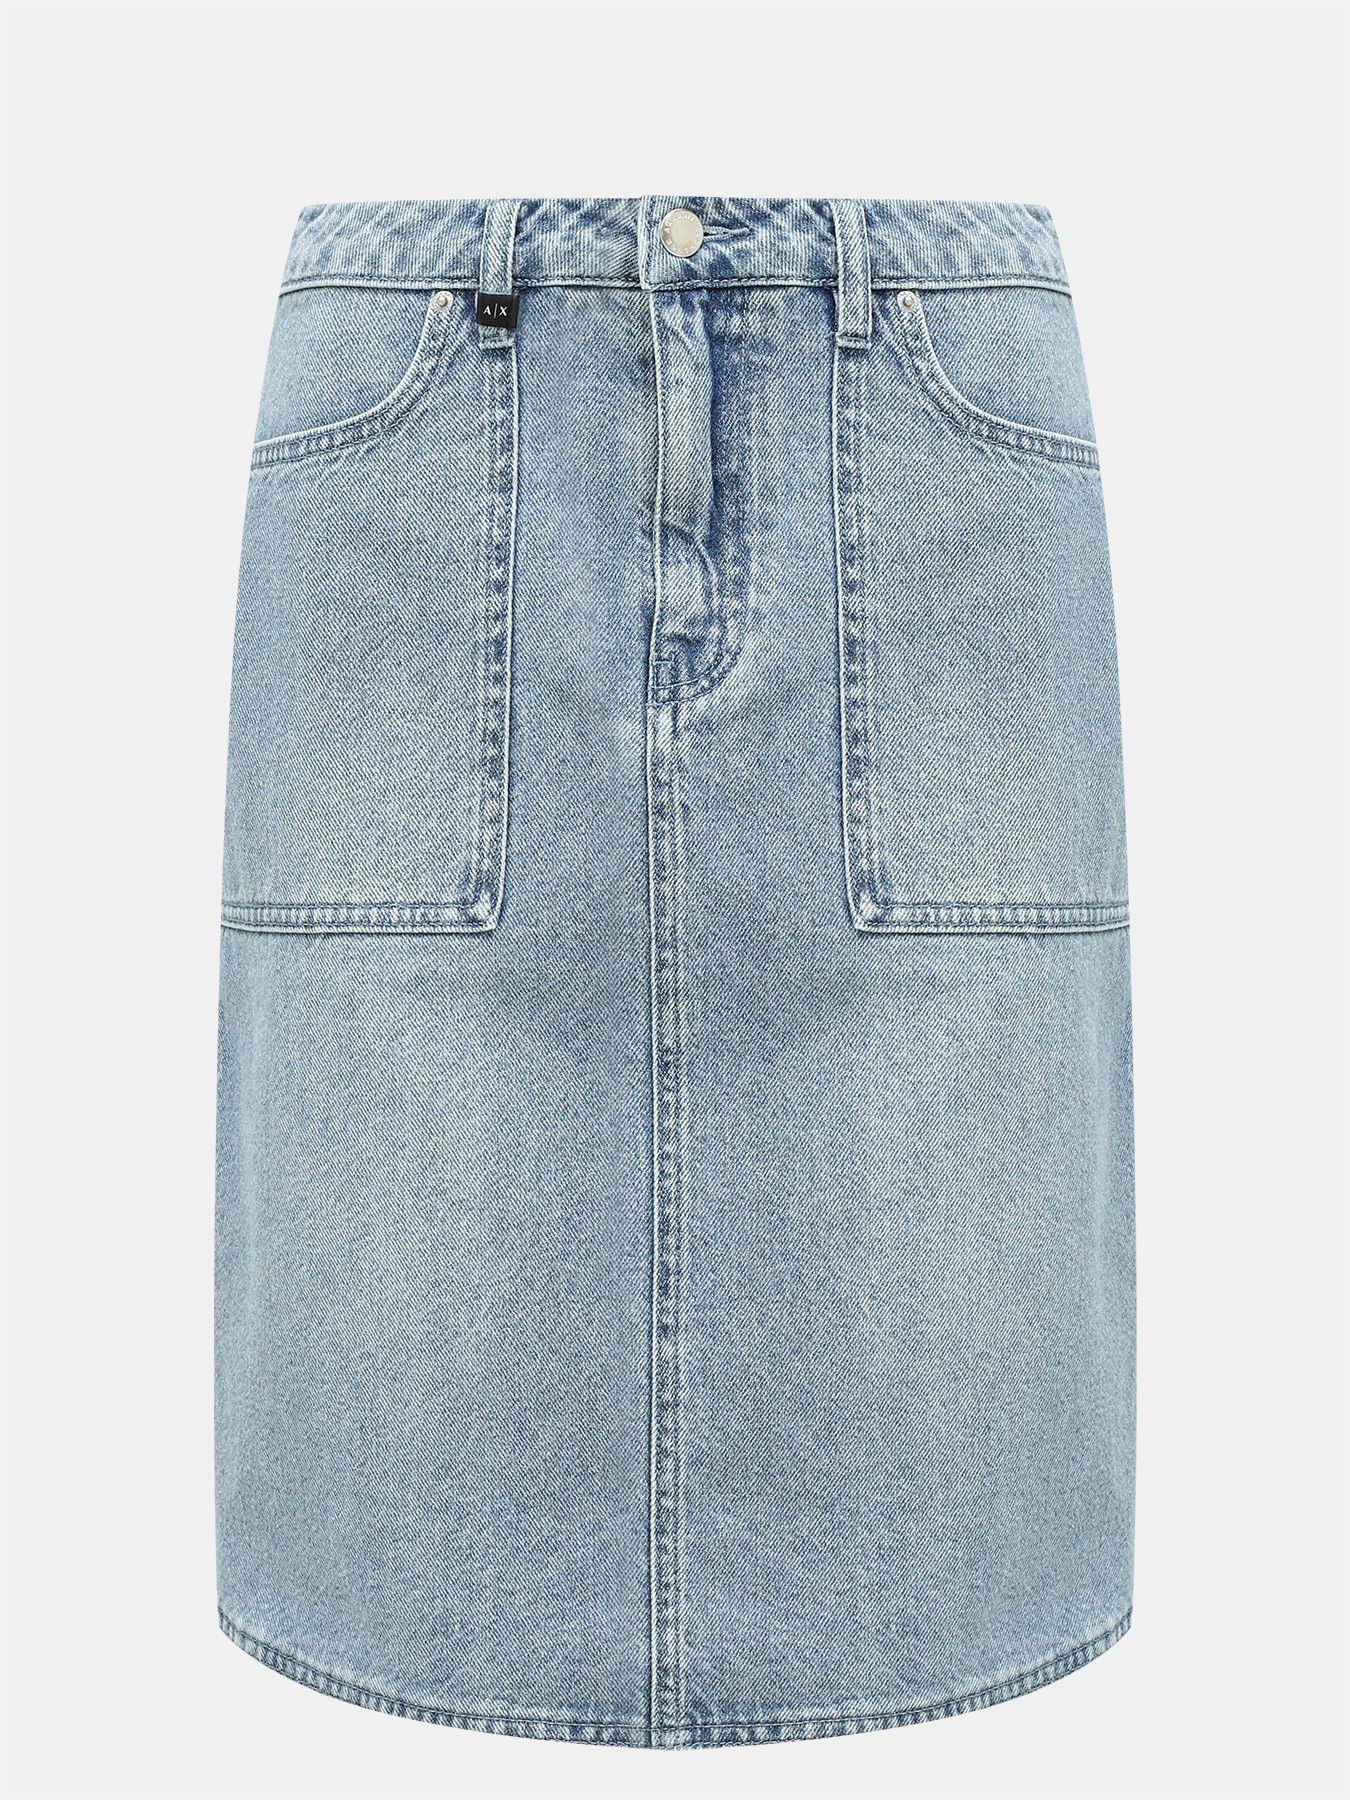 Фото - Юбки Armani Exchange Джинсовая юбка sandro джинсовая юбка